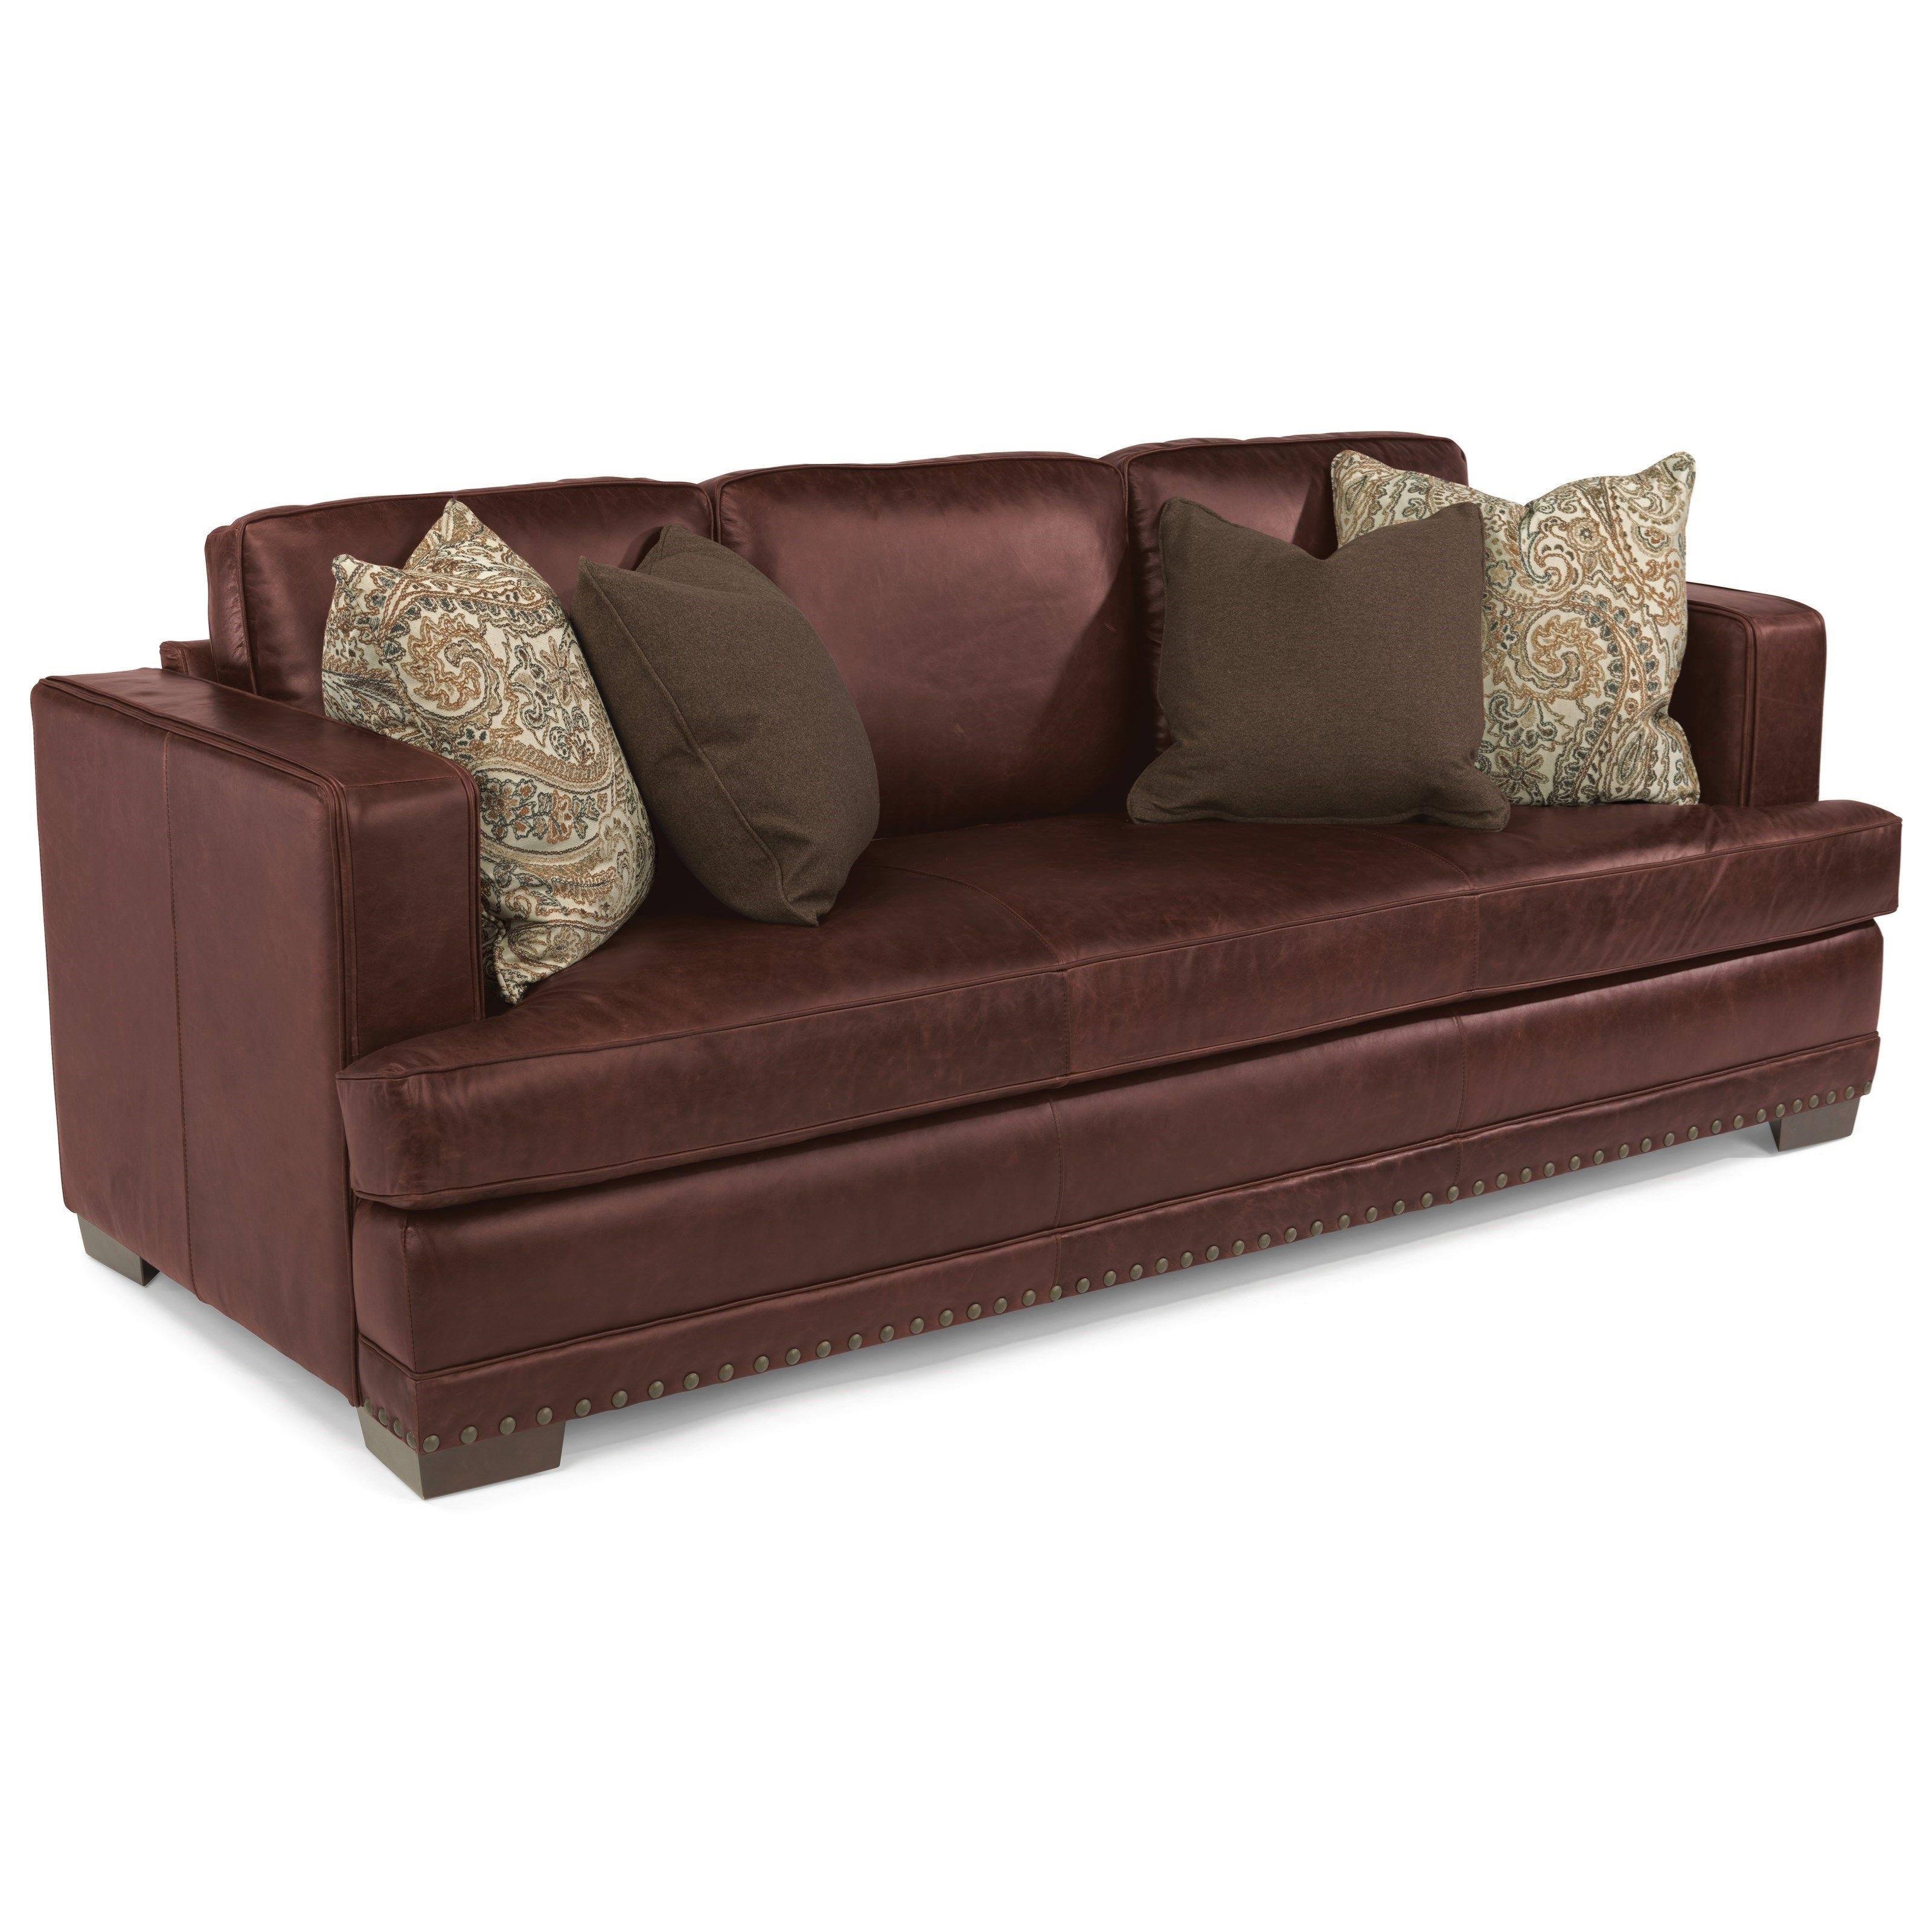 Latitudes-Fulbright Leather Sofa by Flexsteel   furniture   Sofa ...